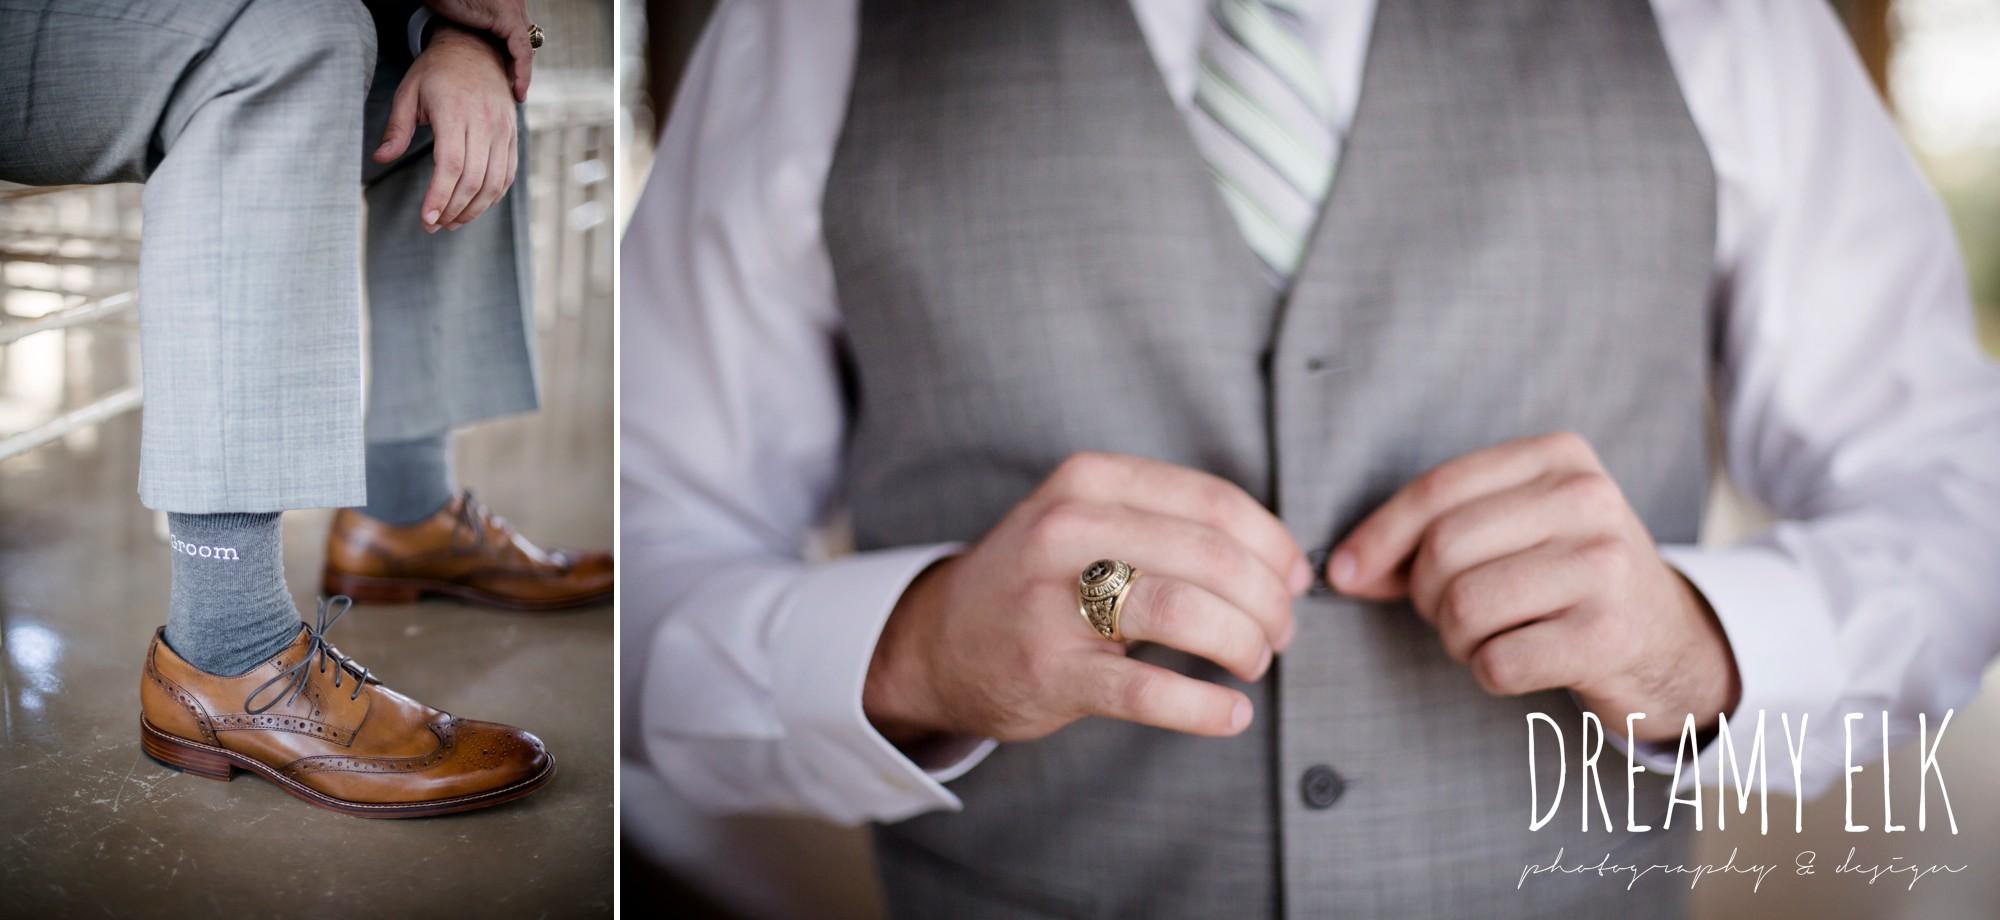 groom socks, mens wearhouse, summer july wedding photo, canyonwood ridge, dripping springs, texas {dreamy elk photography and design}